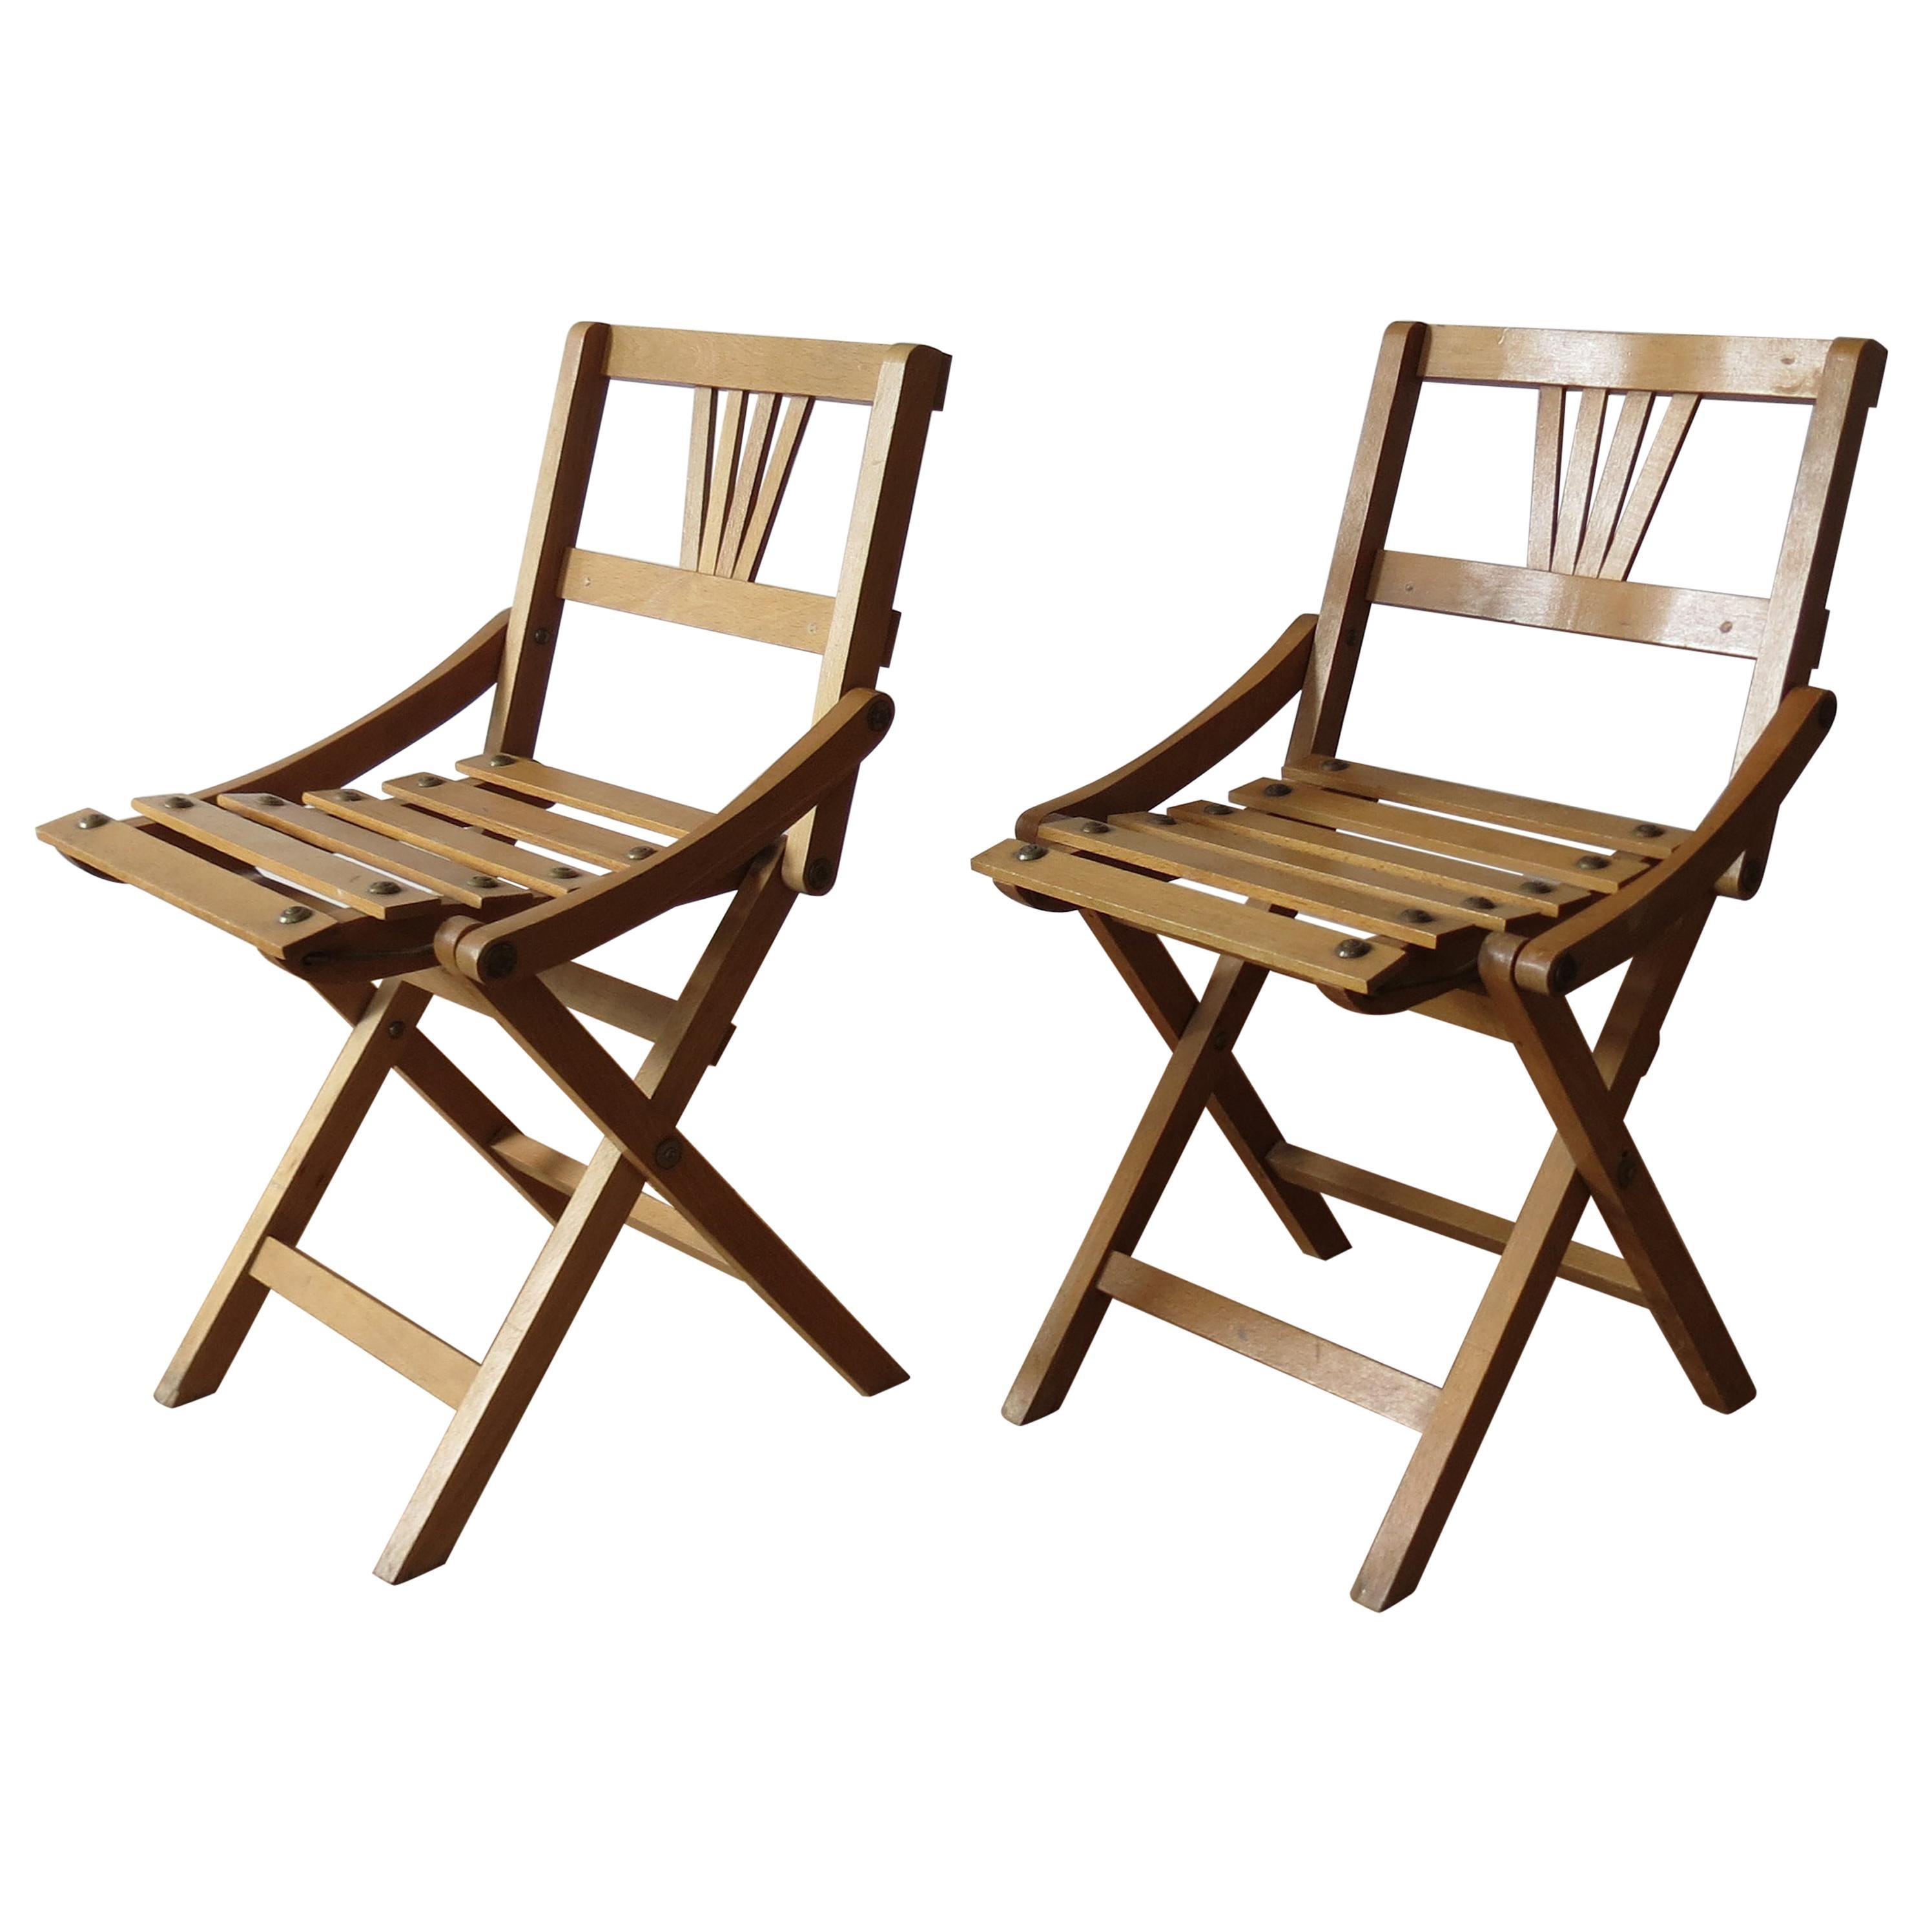 Pair Of Czechoslovakia Vintage Folding Child S Chairs 1940s Sfinx Filakova